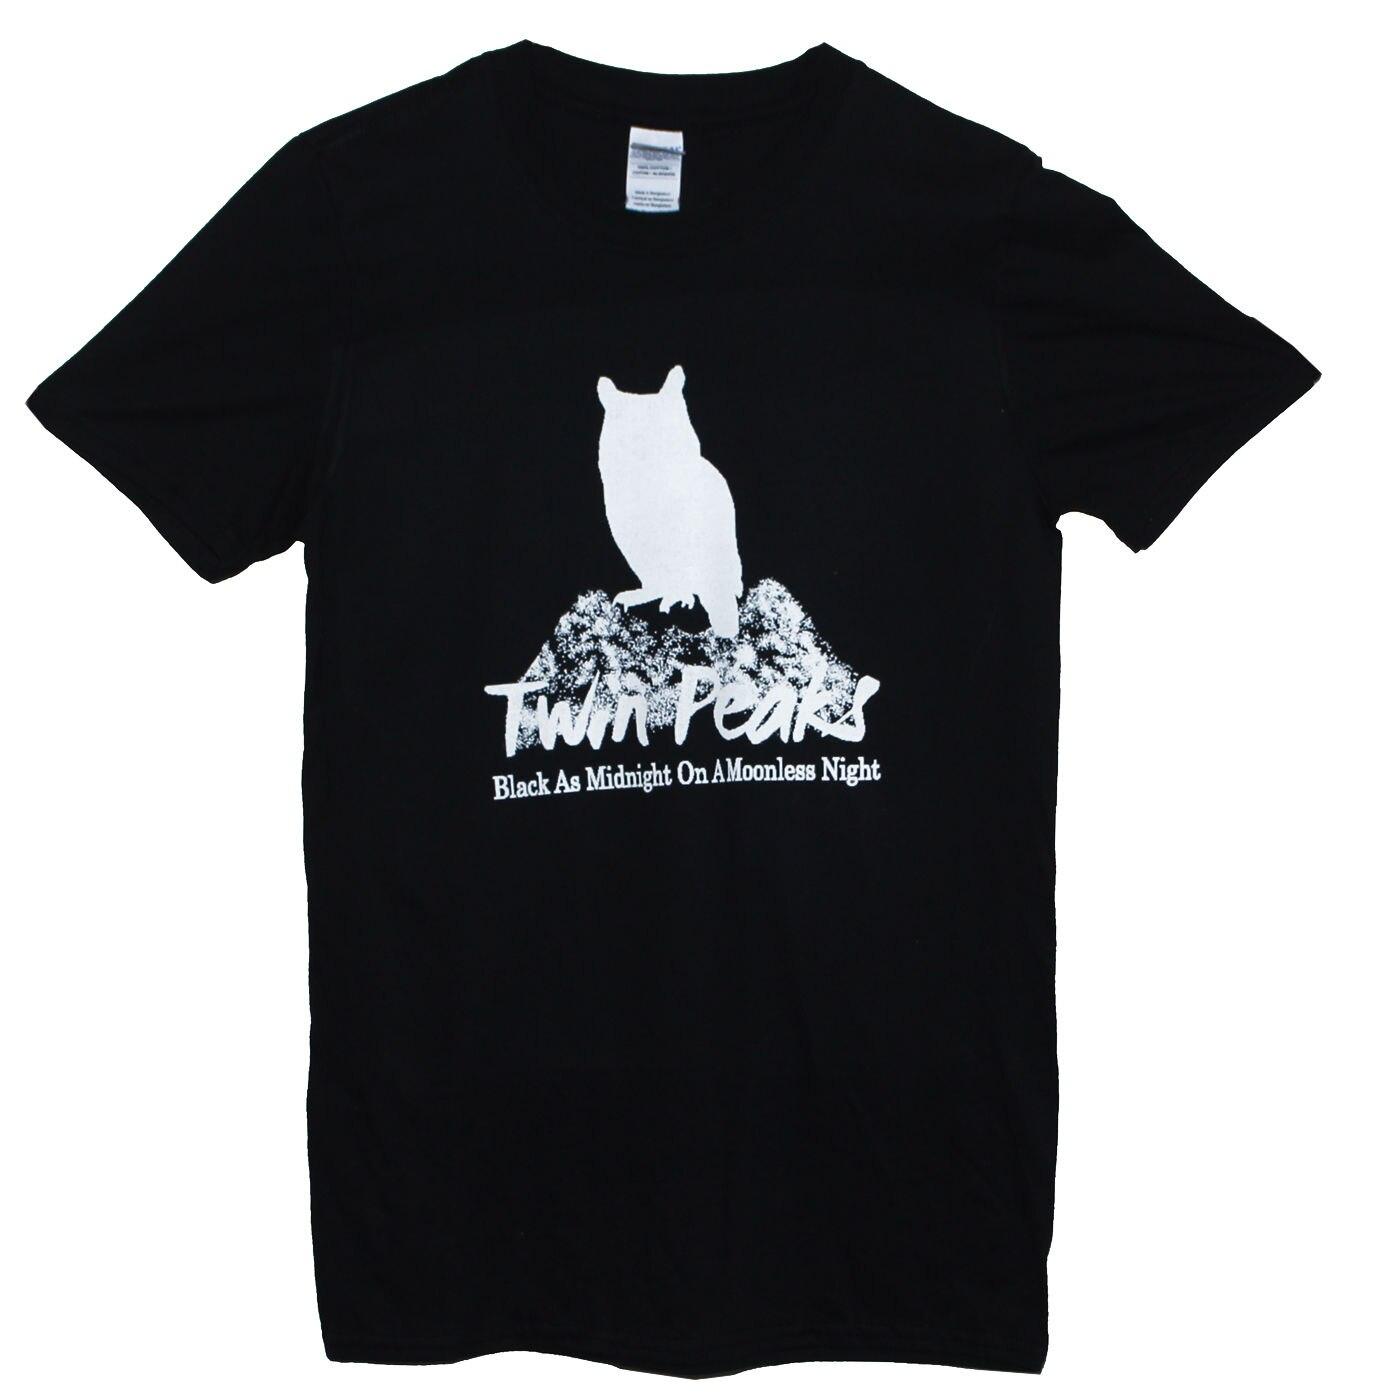 TWIN PEAKS 90s Cult Tv Horror Goth Supernatural Owl Graphic Cool TeeMen Tee Shirt Tops Short Sleeve Cotton Fitness T-Shirt